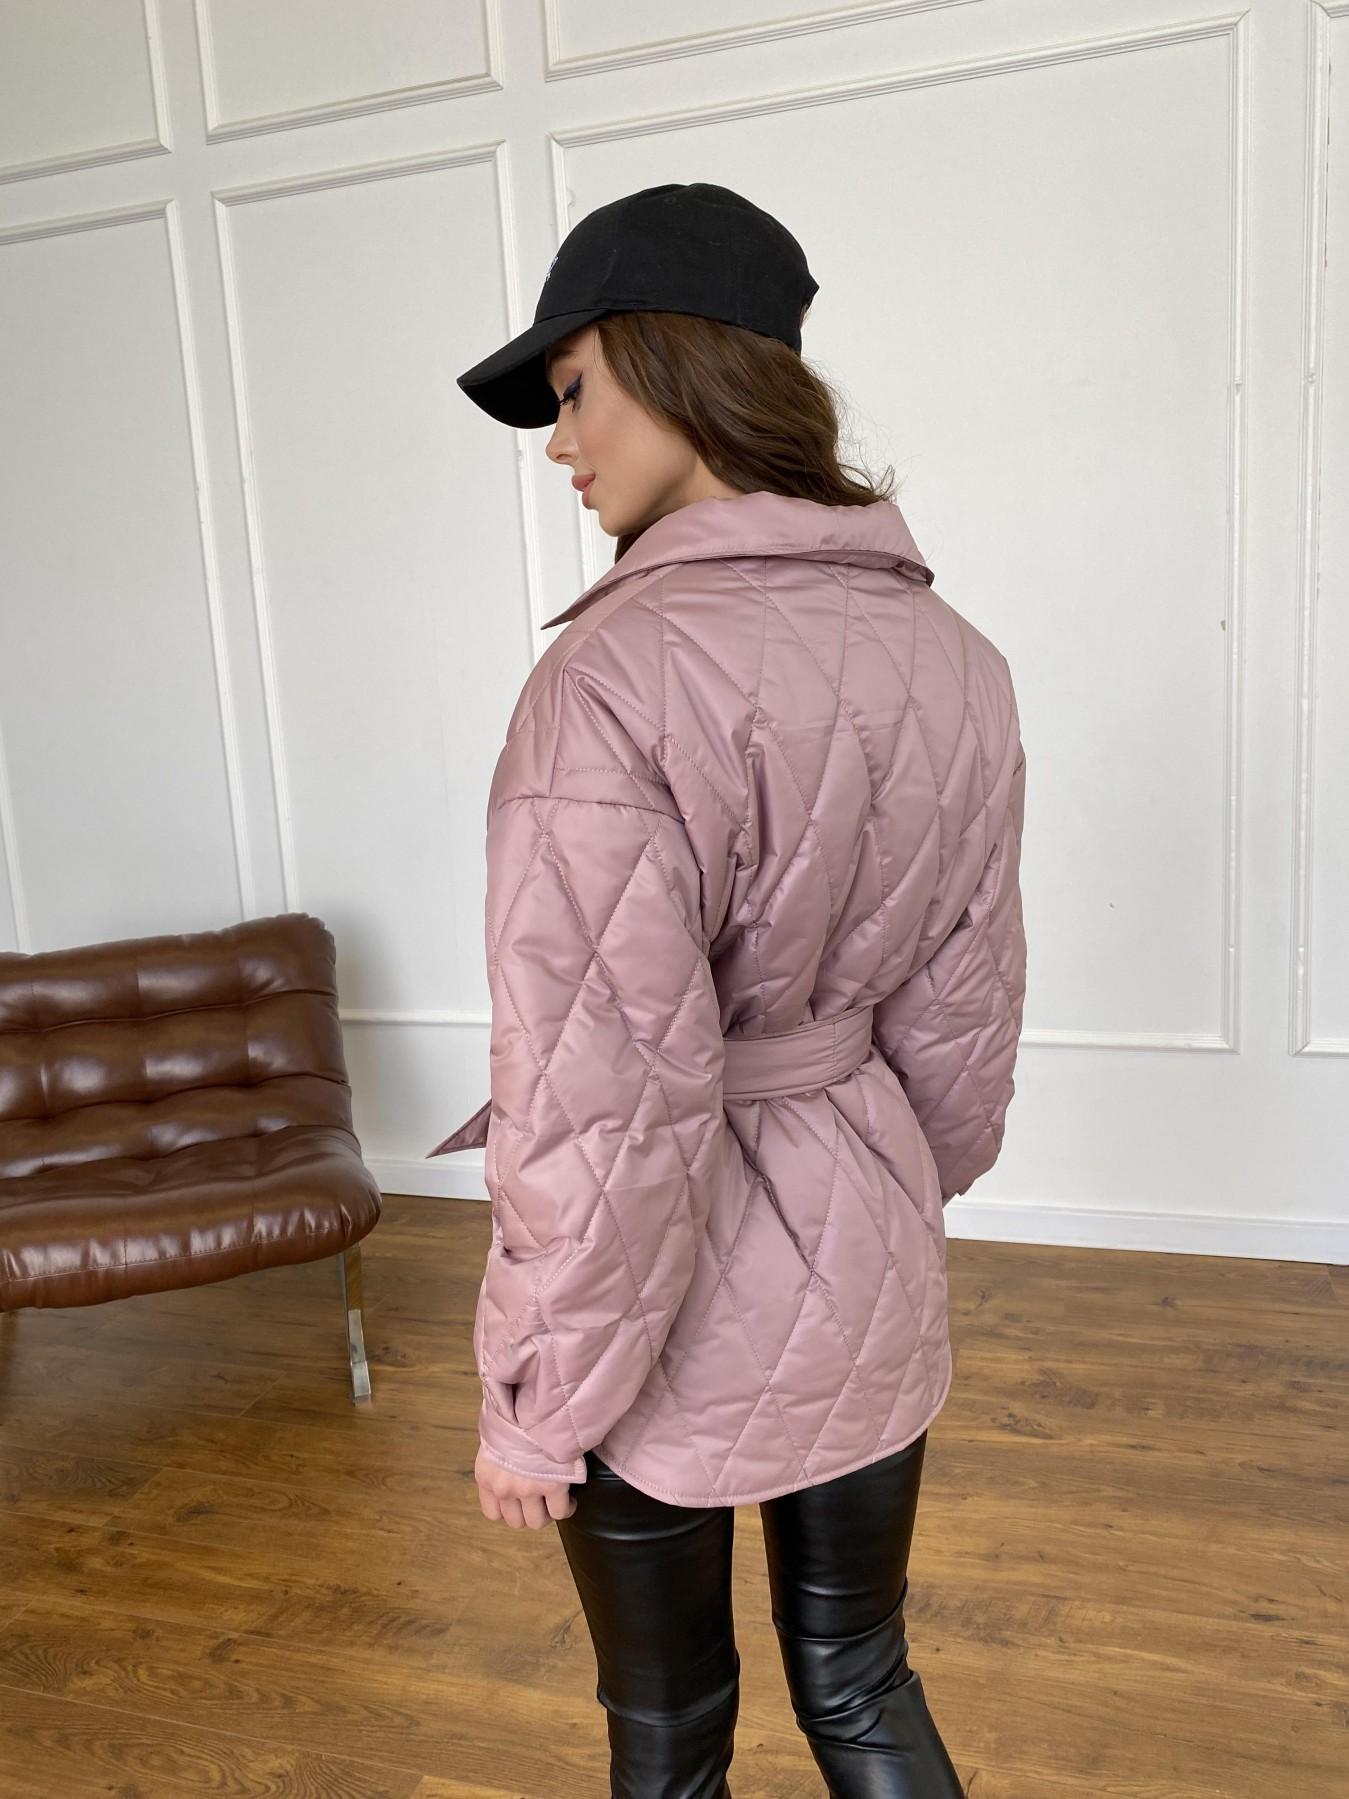 Моно  куртка из плащевой ткани Gloria 11081 АРТ. 47647 Цвет: Пудра - фото 9, интернет магазин tm-modus.ru